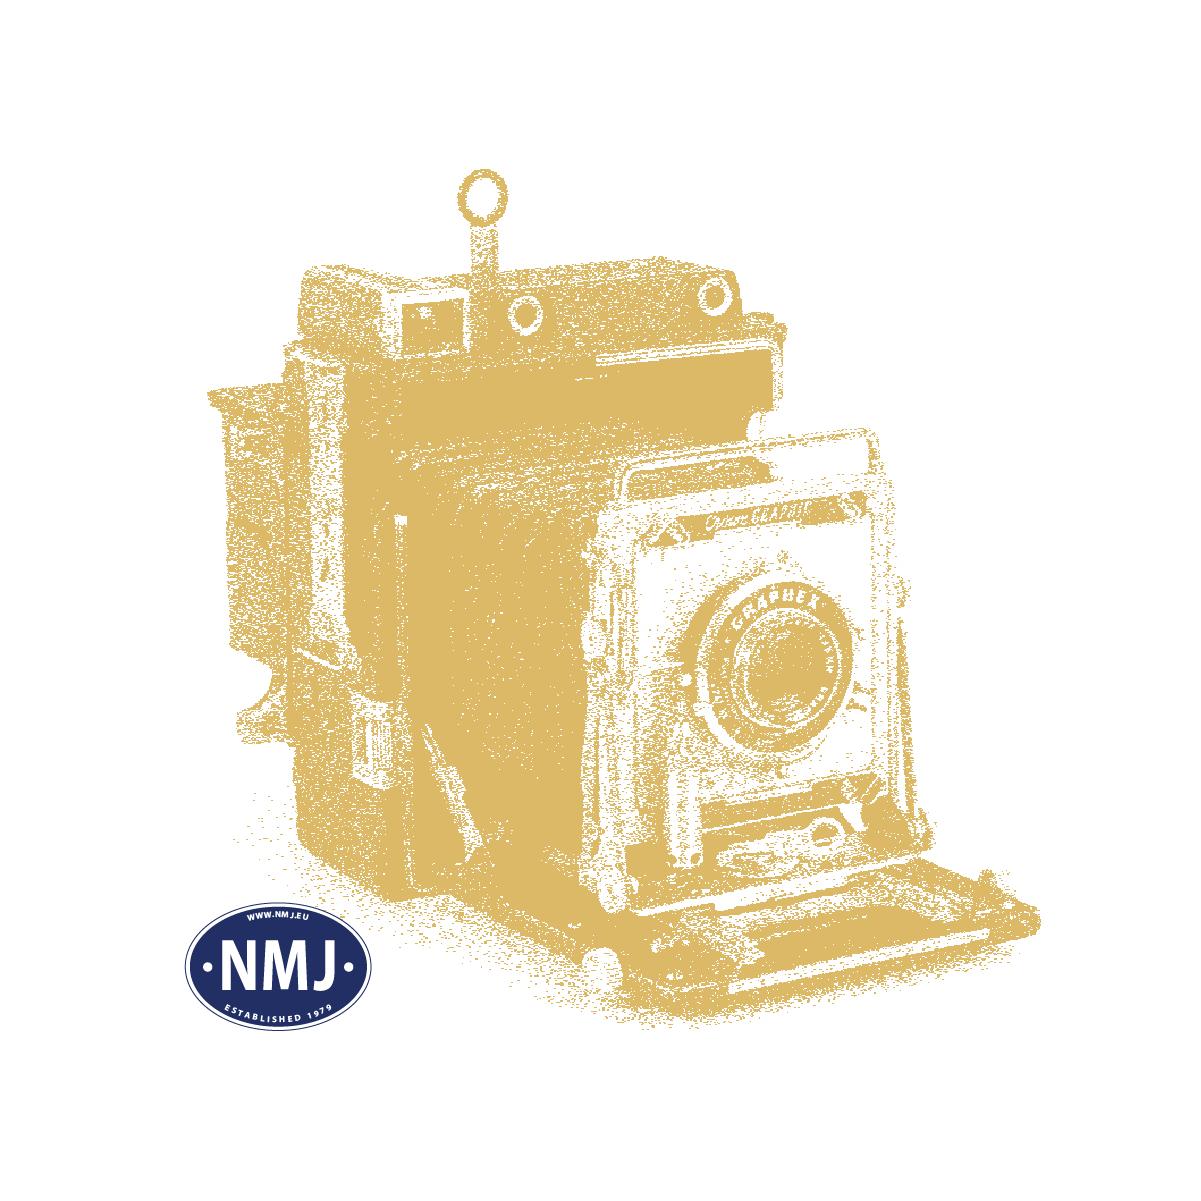 NMJT82.401 - NMJ Topline NSB El13.2144, rot/schwarz, DC